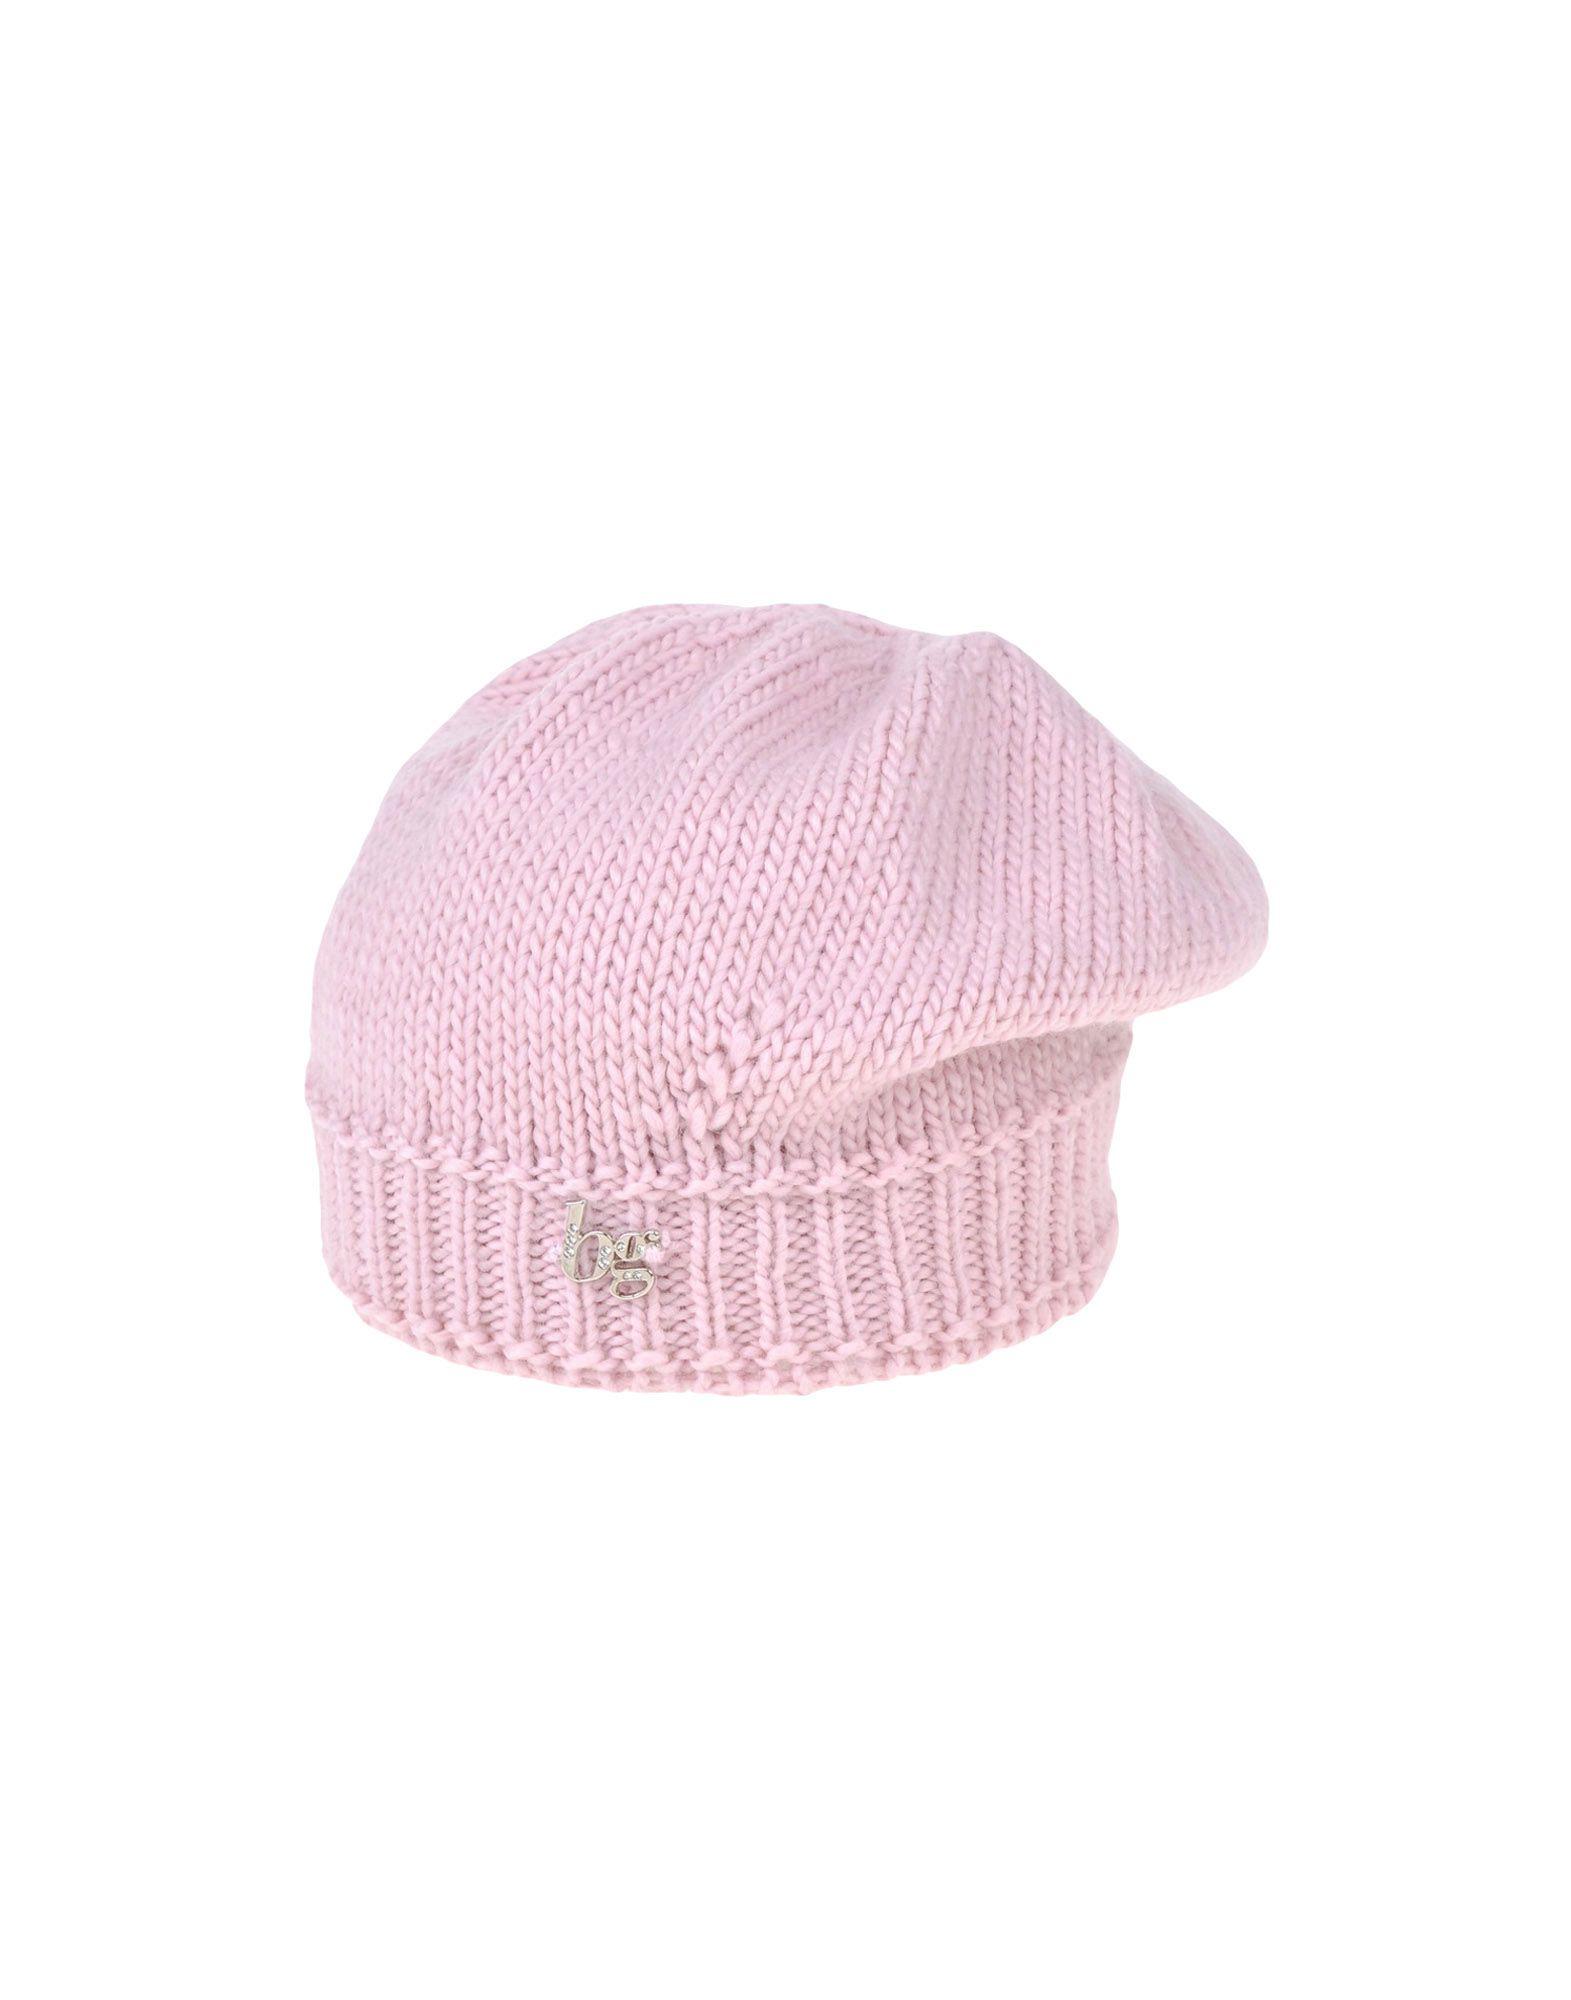 ACCESSORIES - Hats Blugirl EuTInO